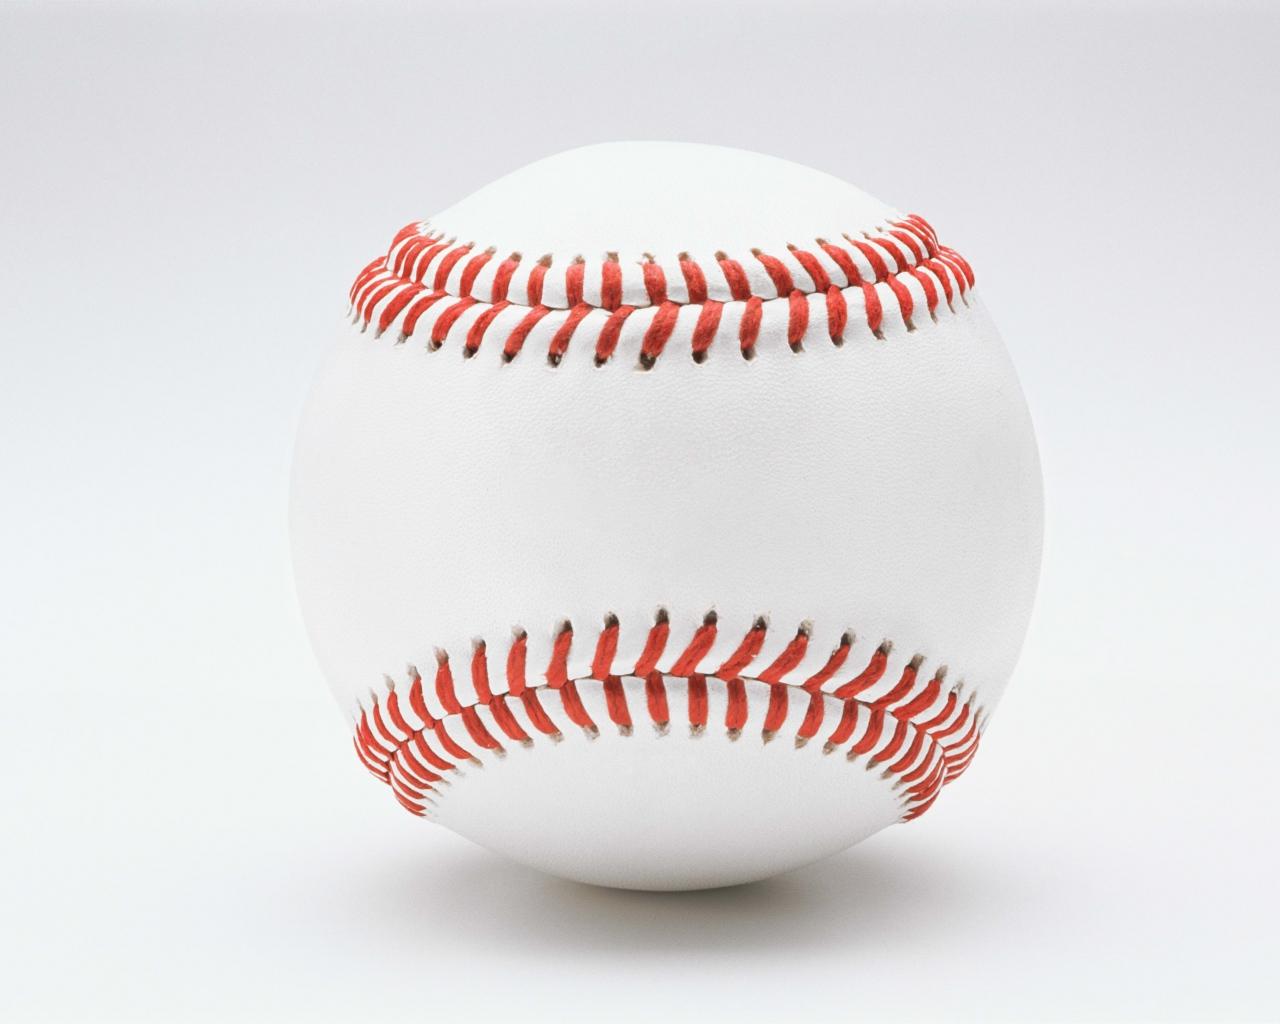 ball_white_background_baseball_79951_1280x1024